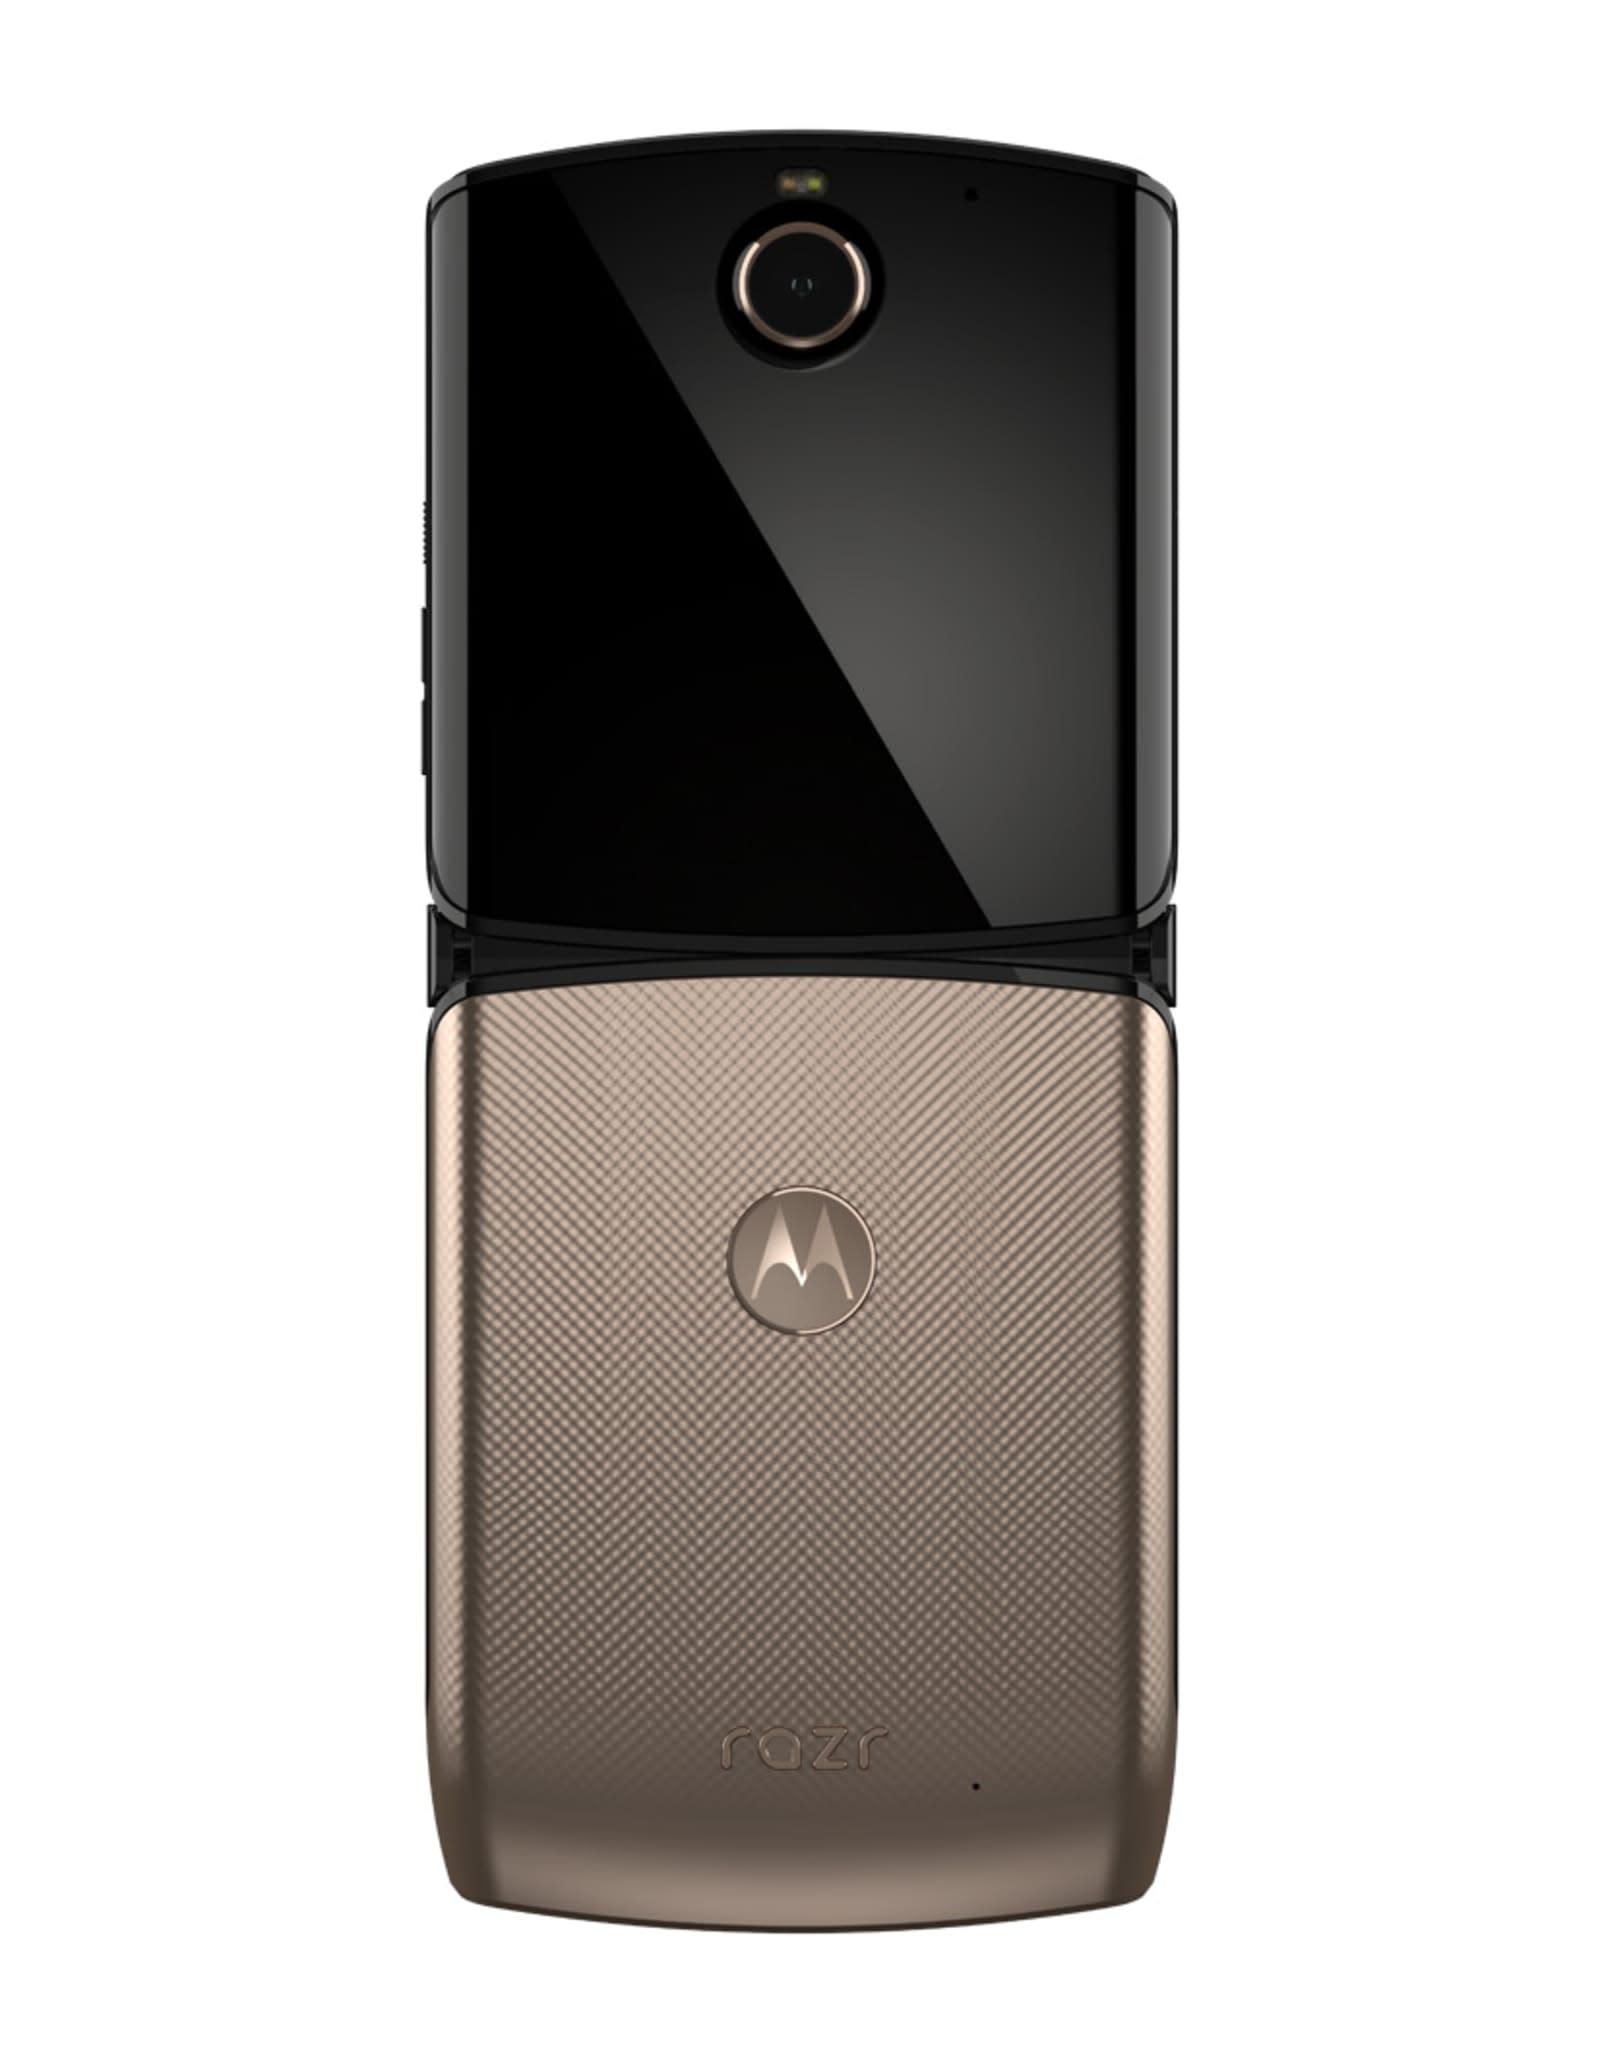 Motorola Razr (2020) in Blush Gold